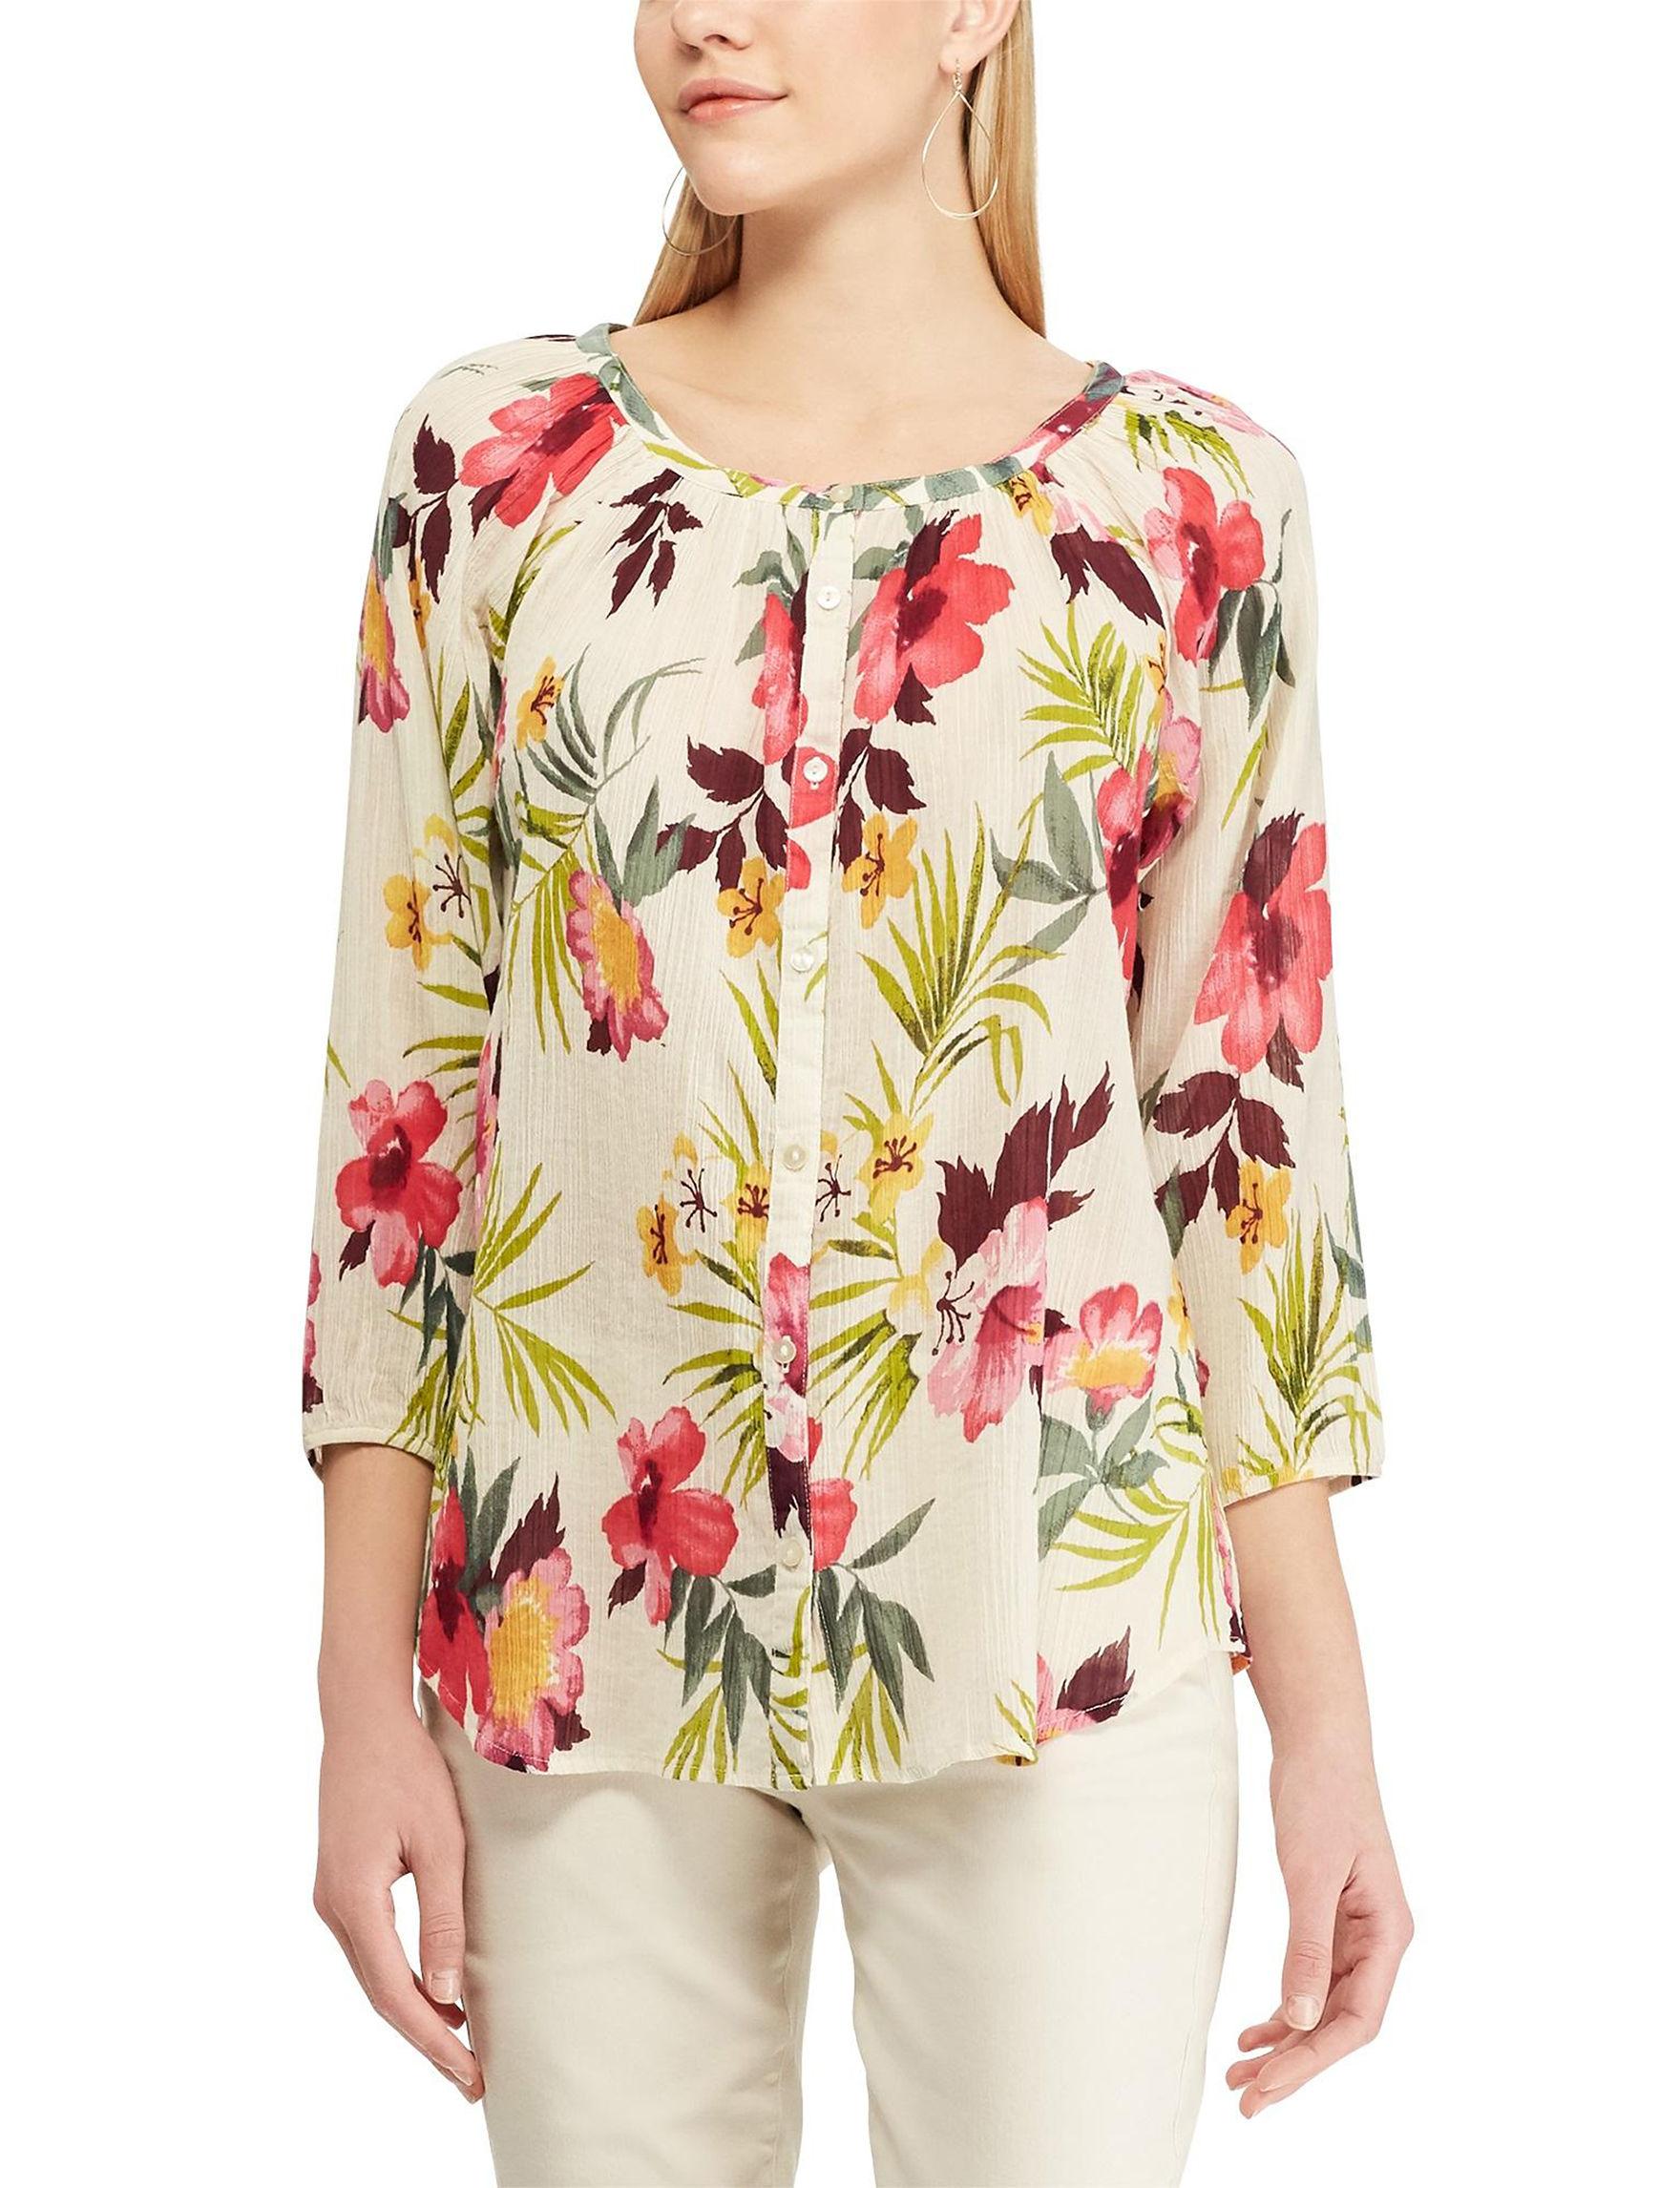 Chaps Beige / Multi Shirts & Blouses